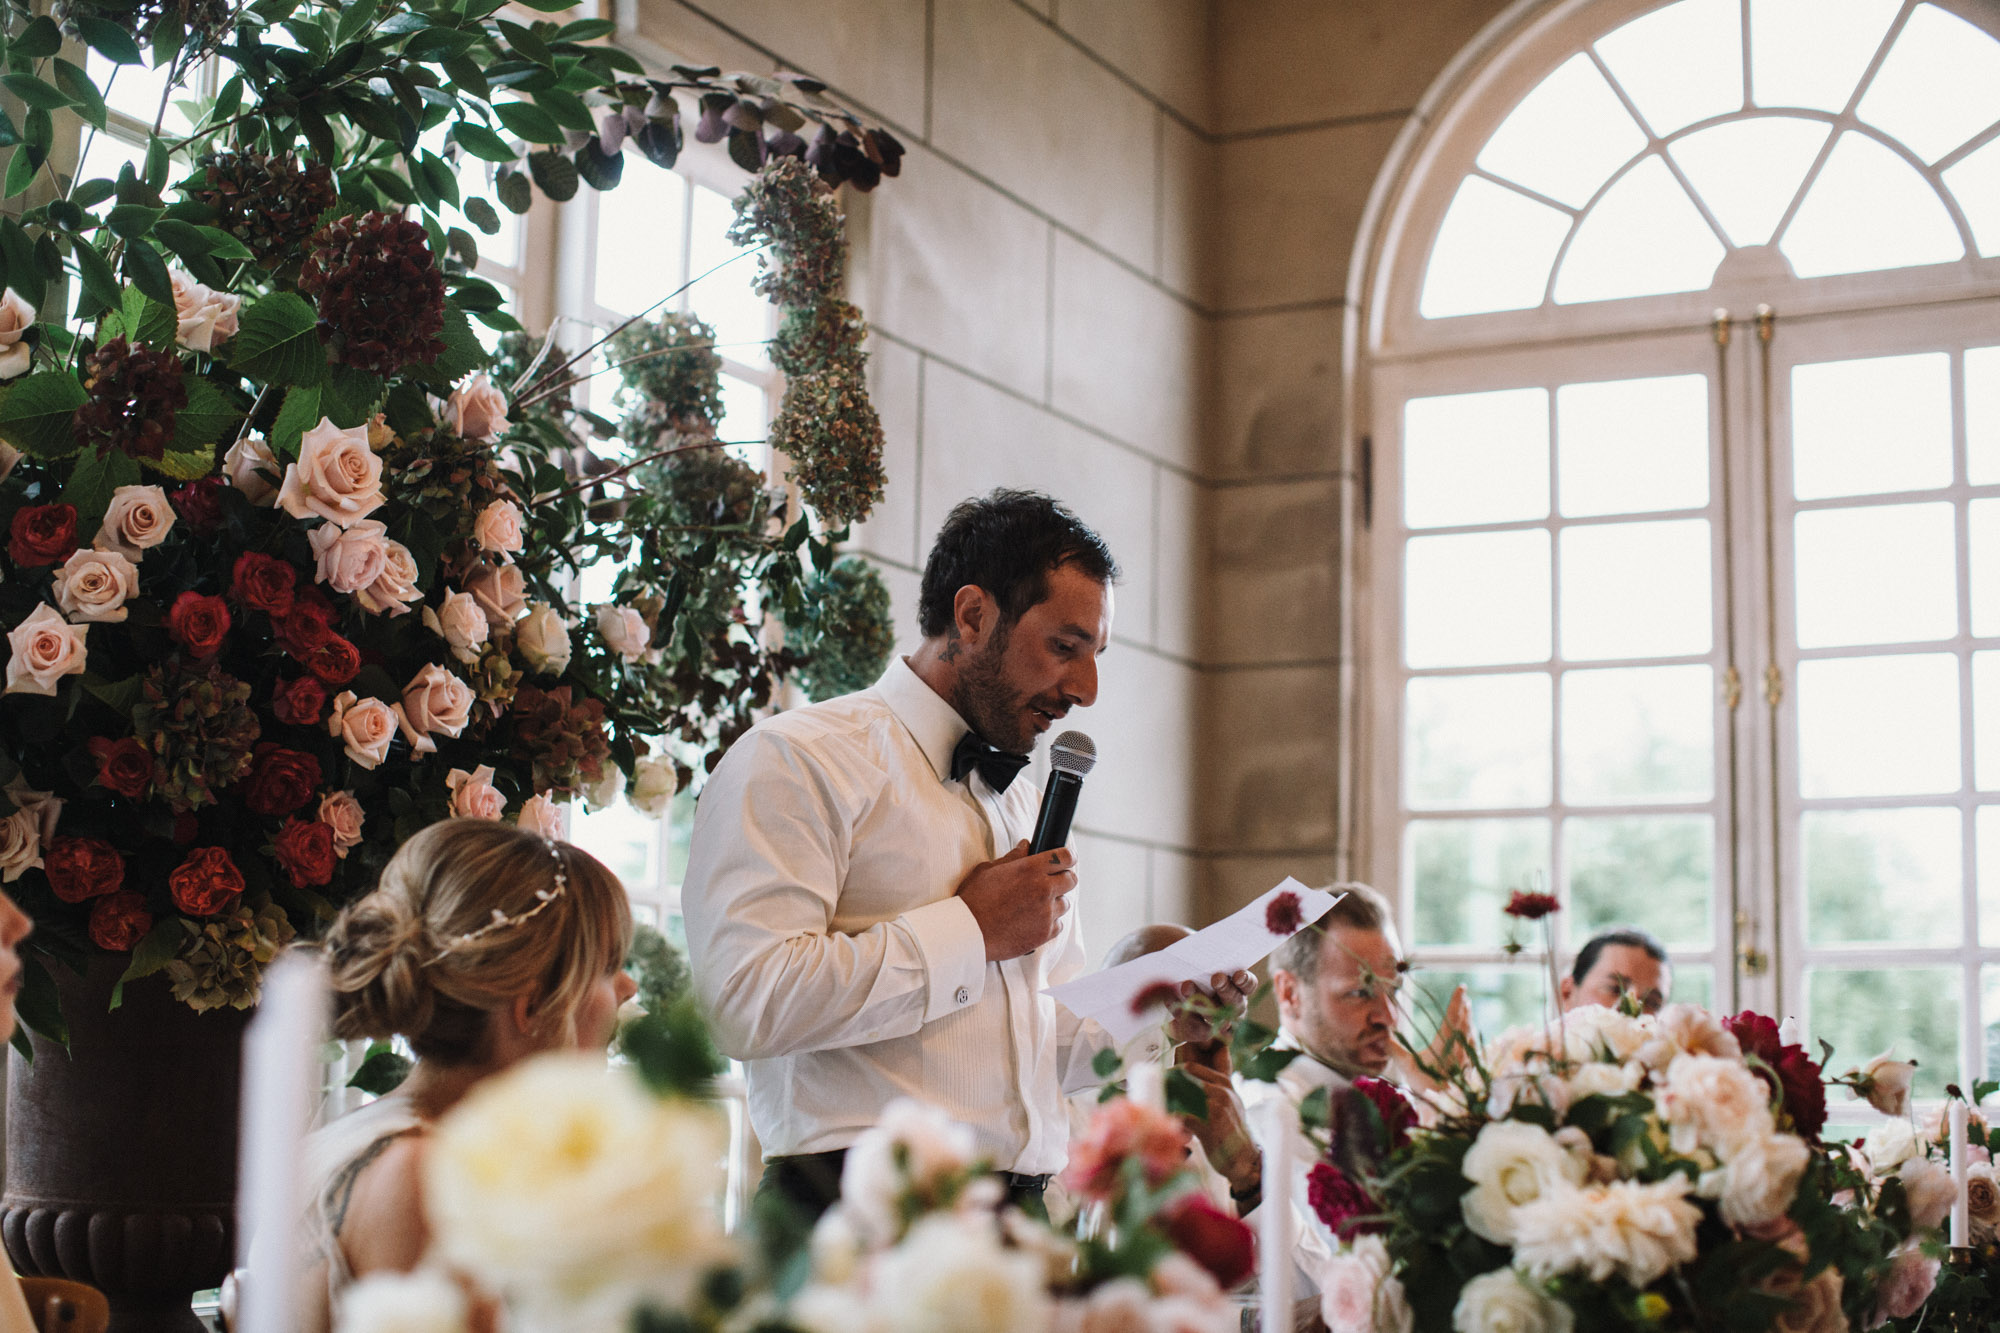 Campbell Point House Wedding HJ + Dean Raphael Weddings-125.jpg